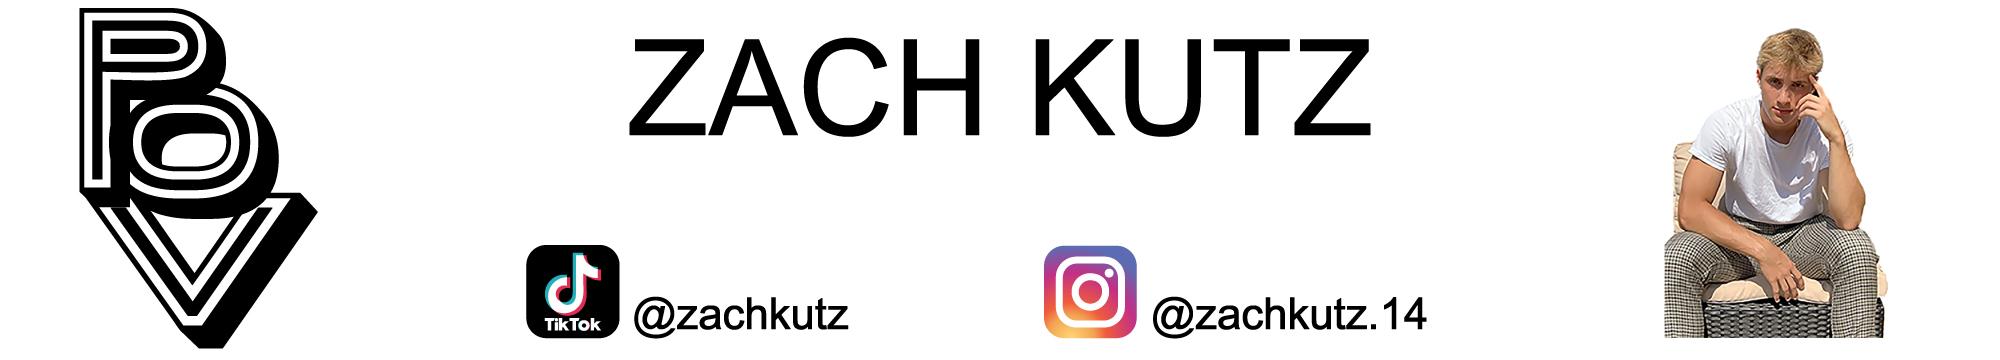 Zach Kutz